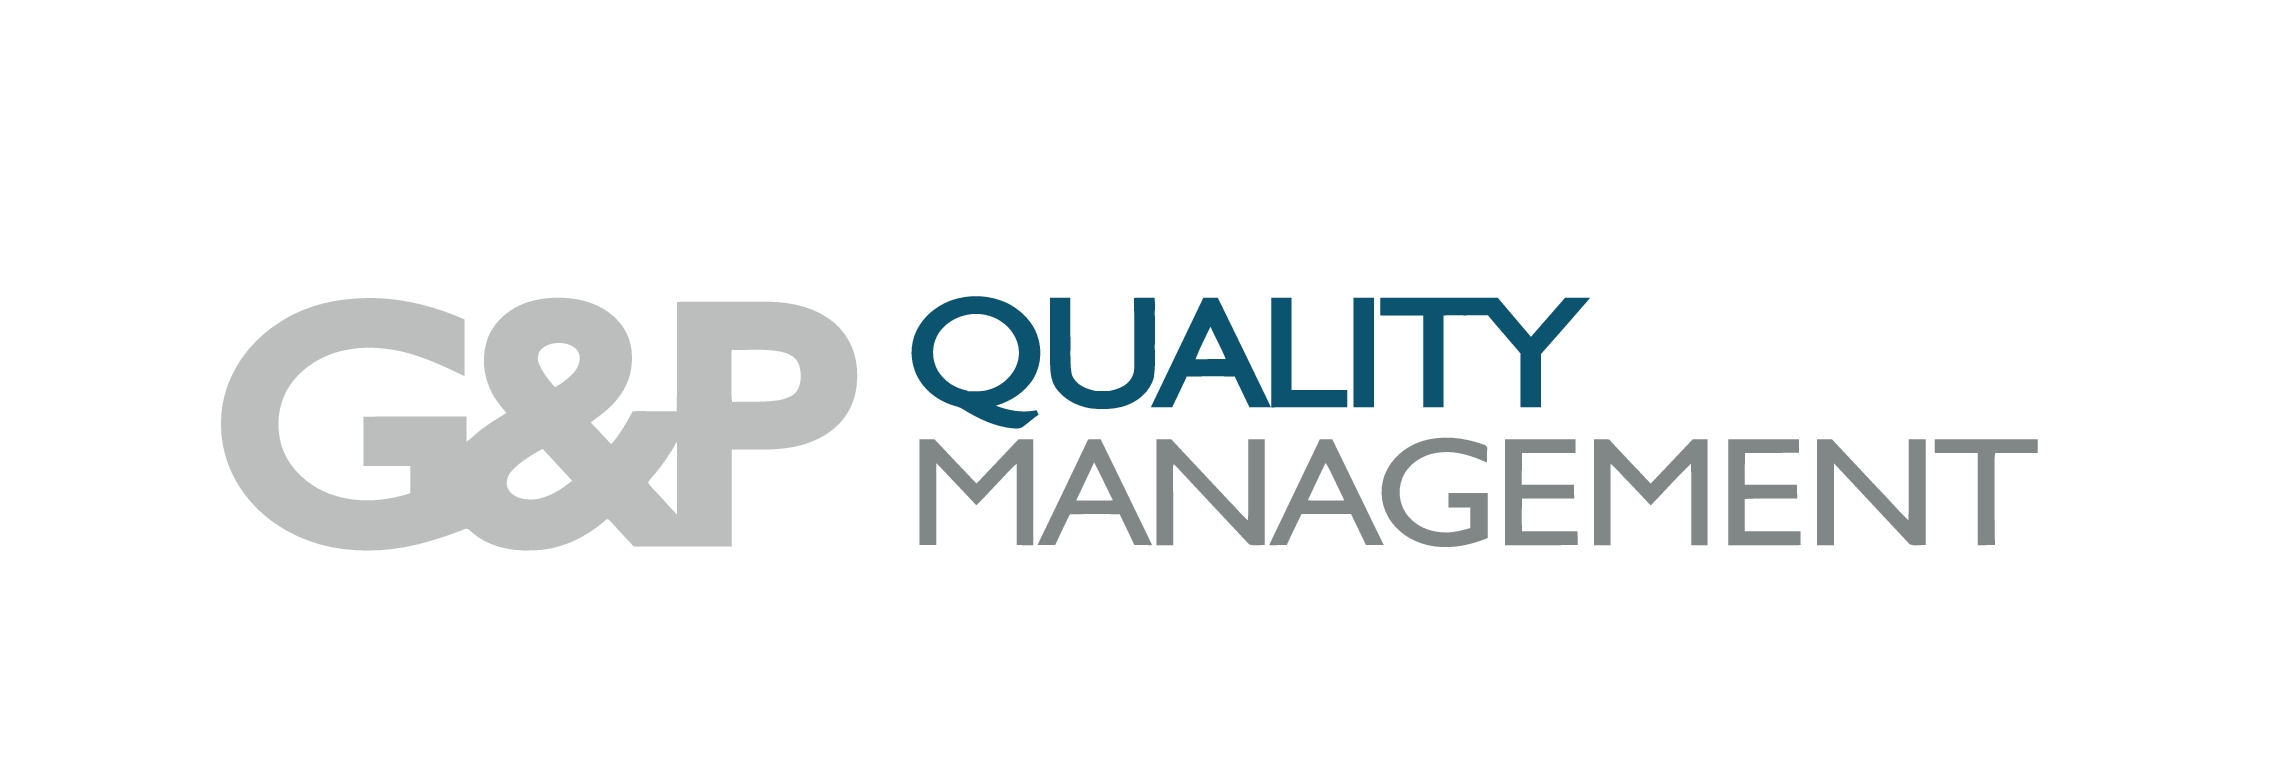 platina-gp-quality-management